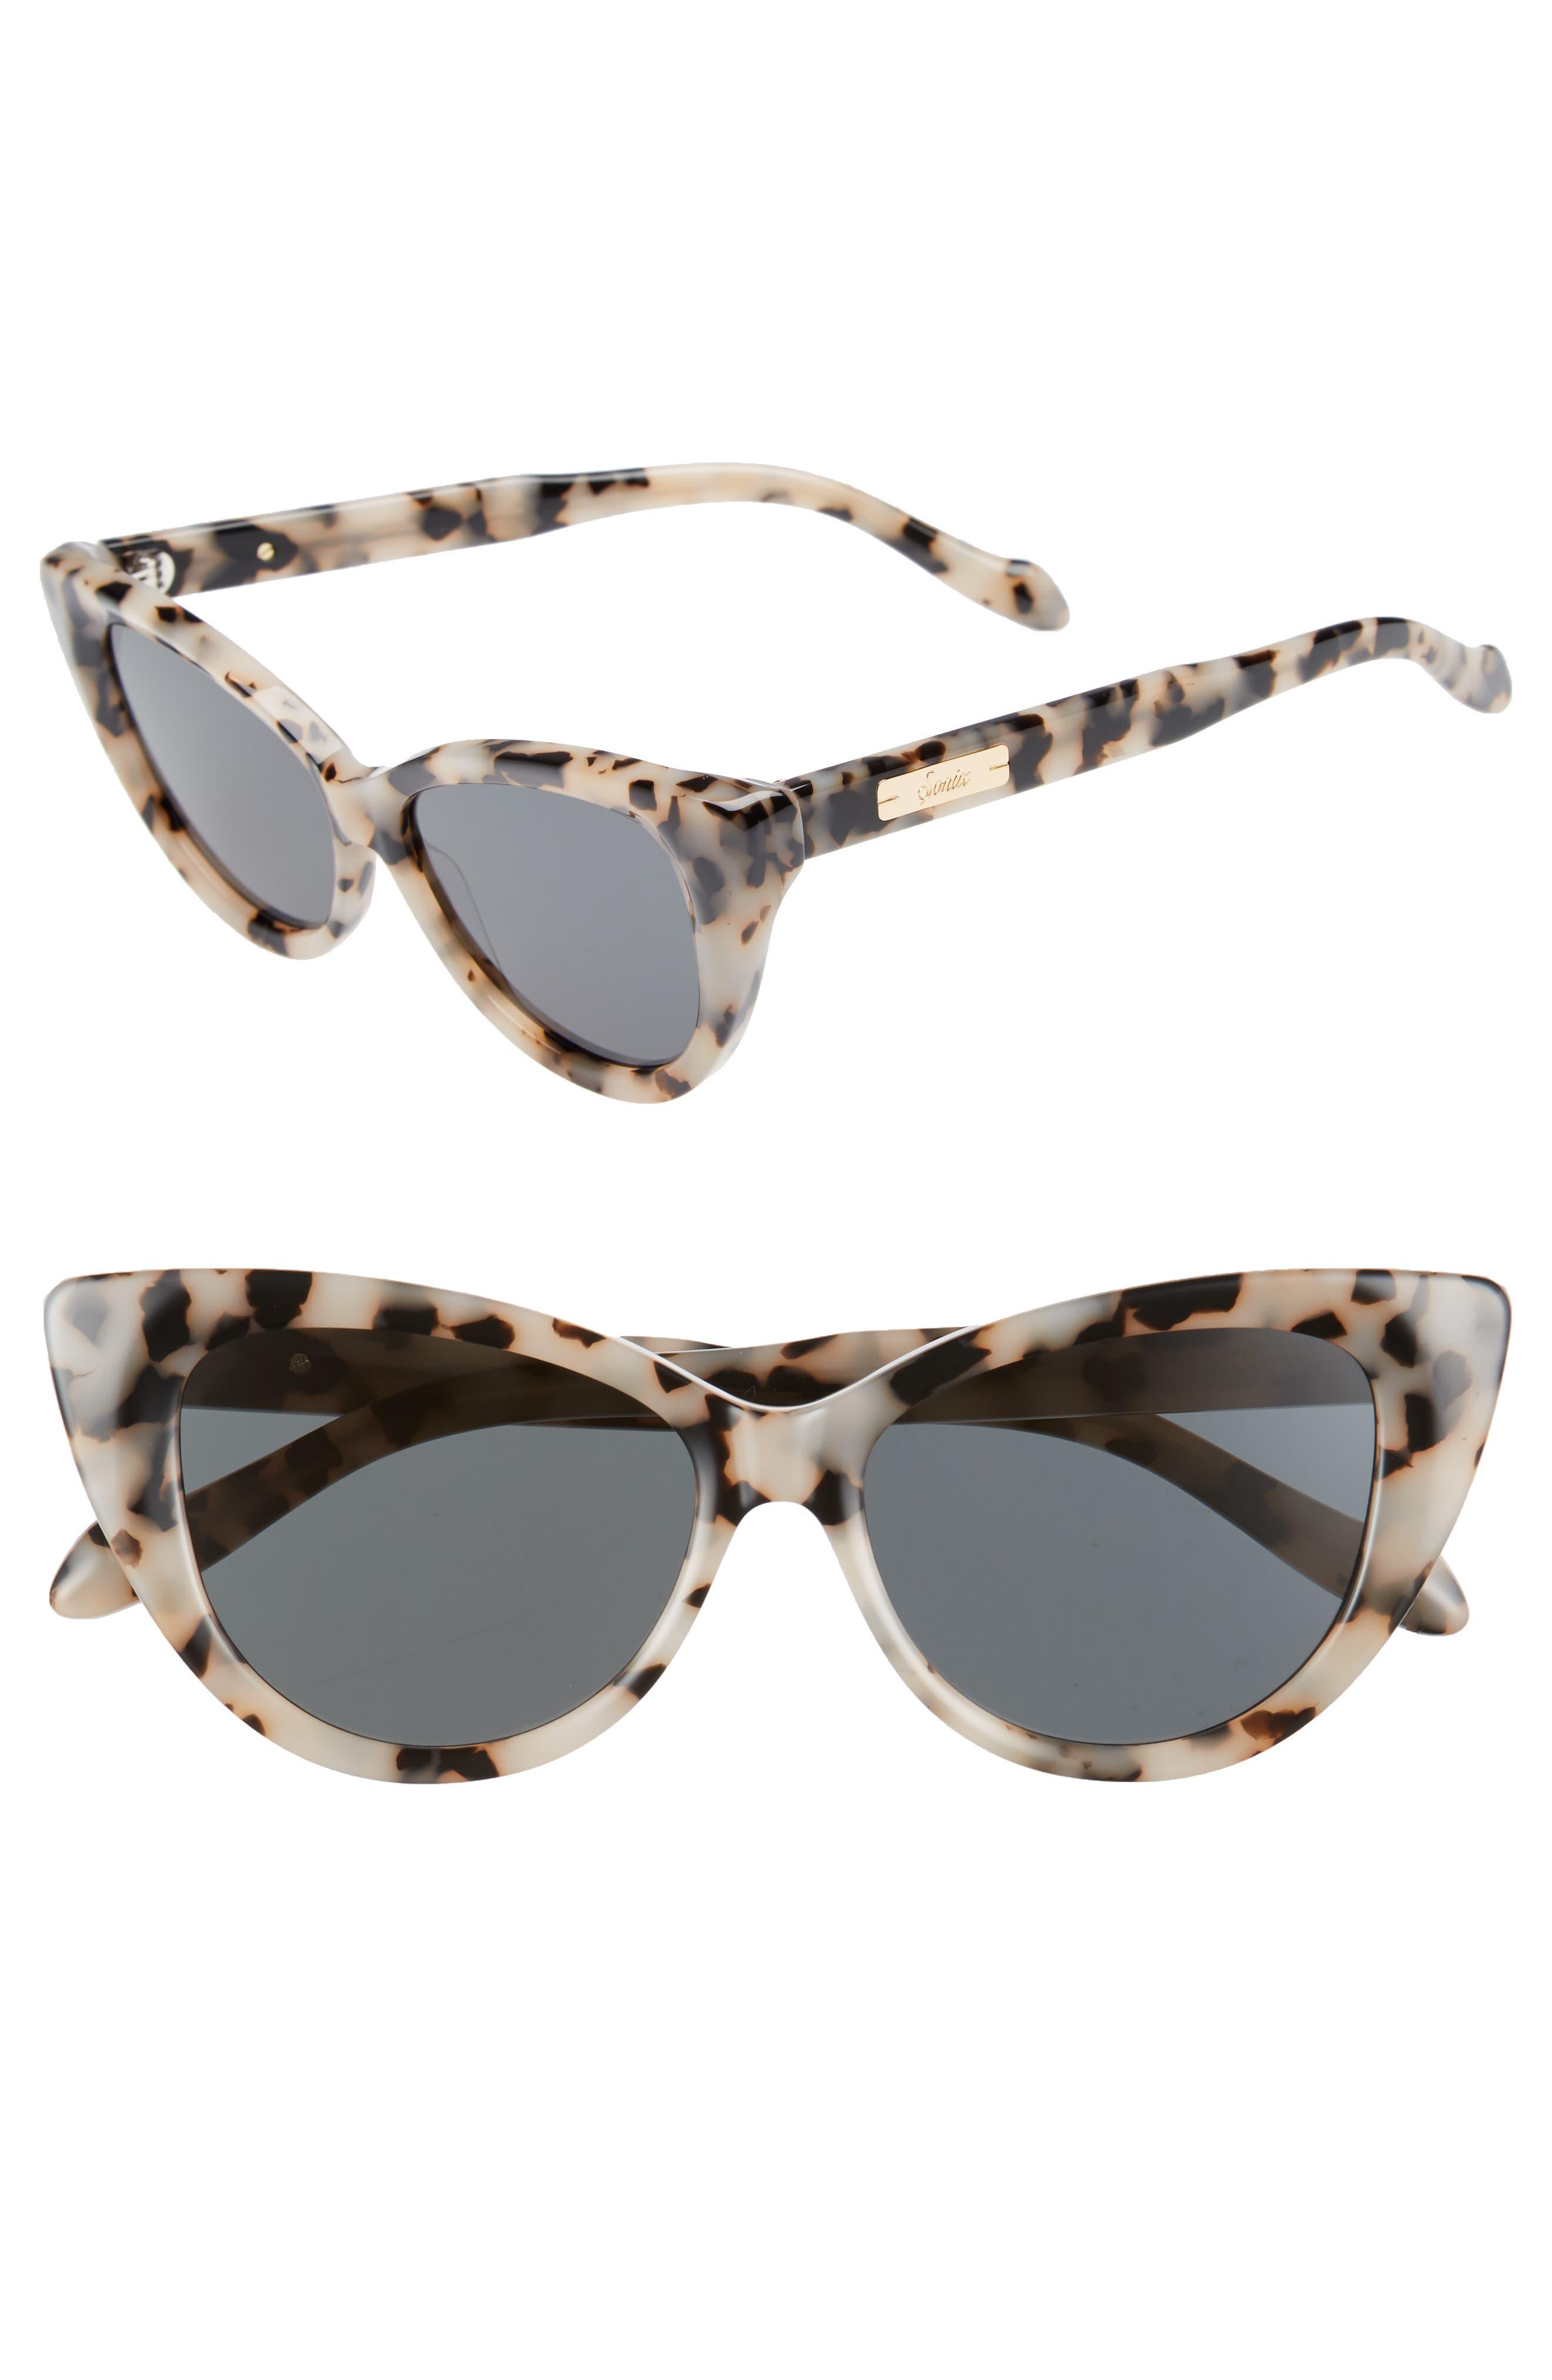 Kyoto 51mm Cat Eye Sunglasses,                             Main thumbnail 1, color,                             Milk Tortoise/ Black Solid